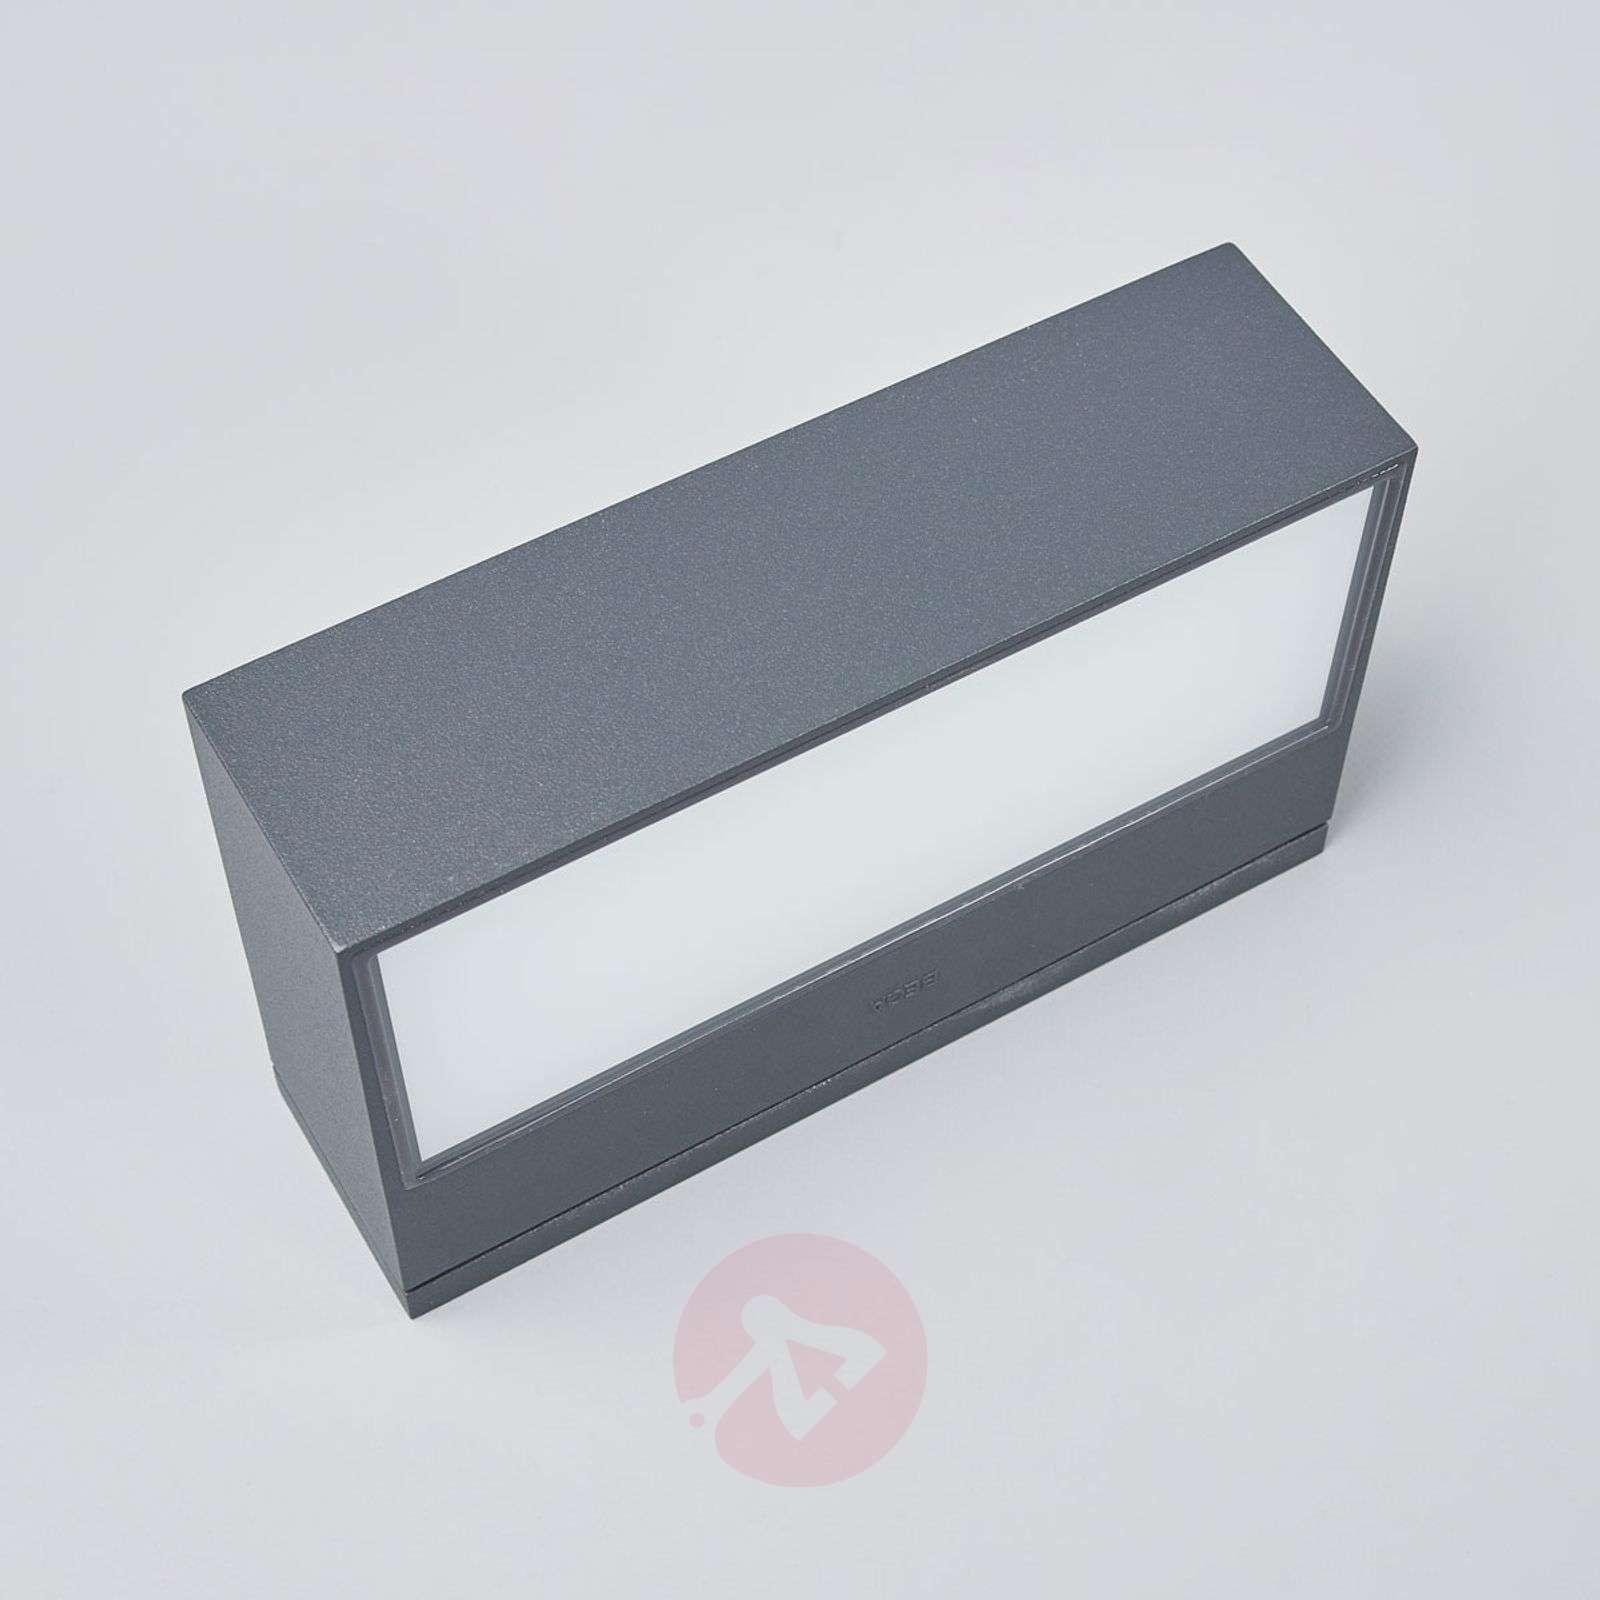 Bega LED outdoor wall lamp Elton-1566015-01